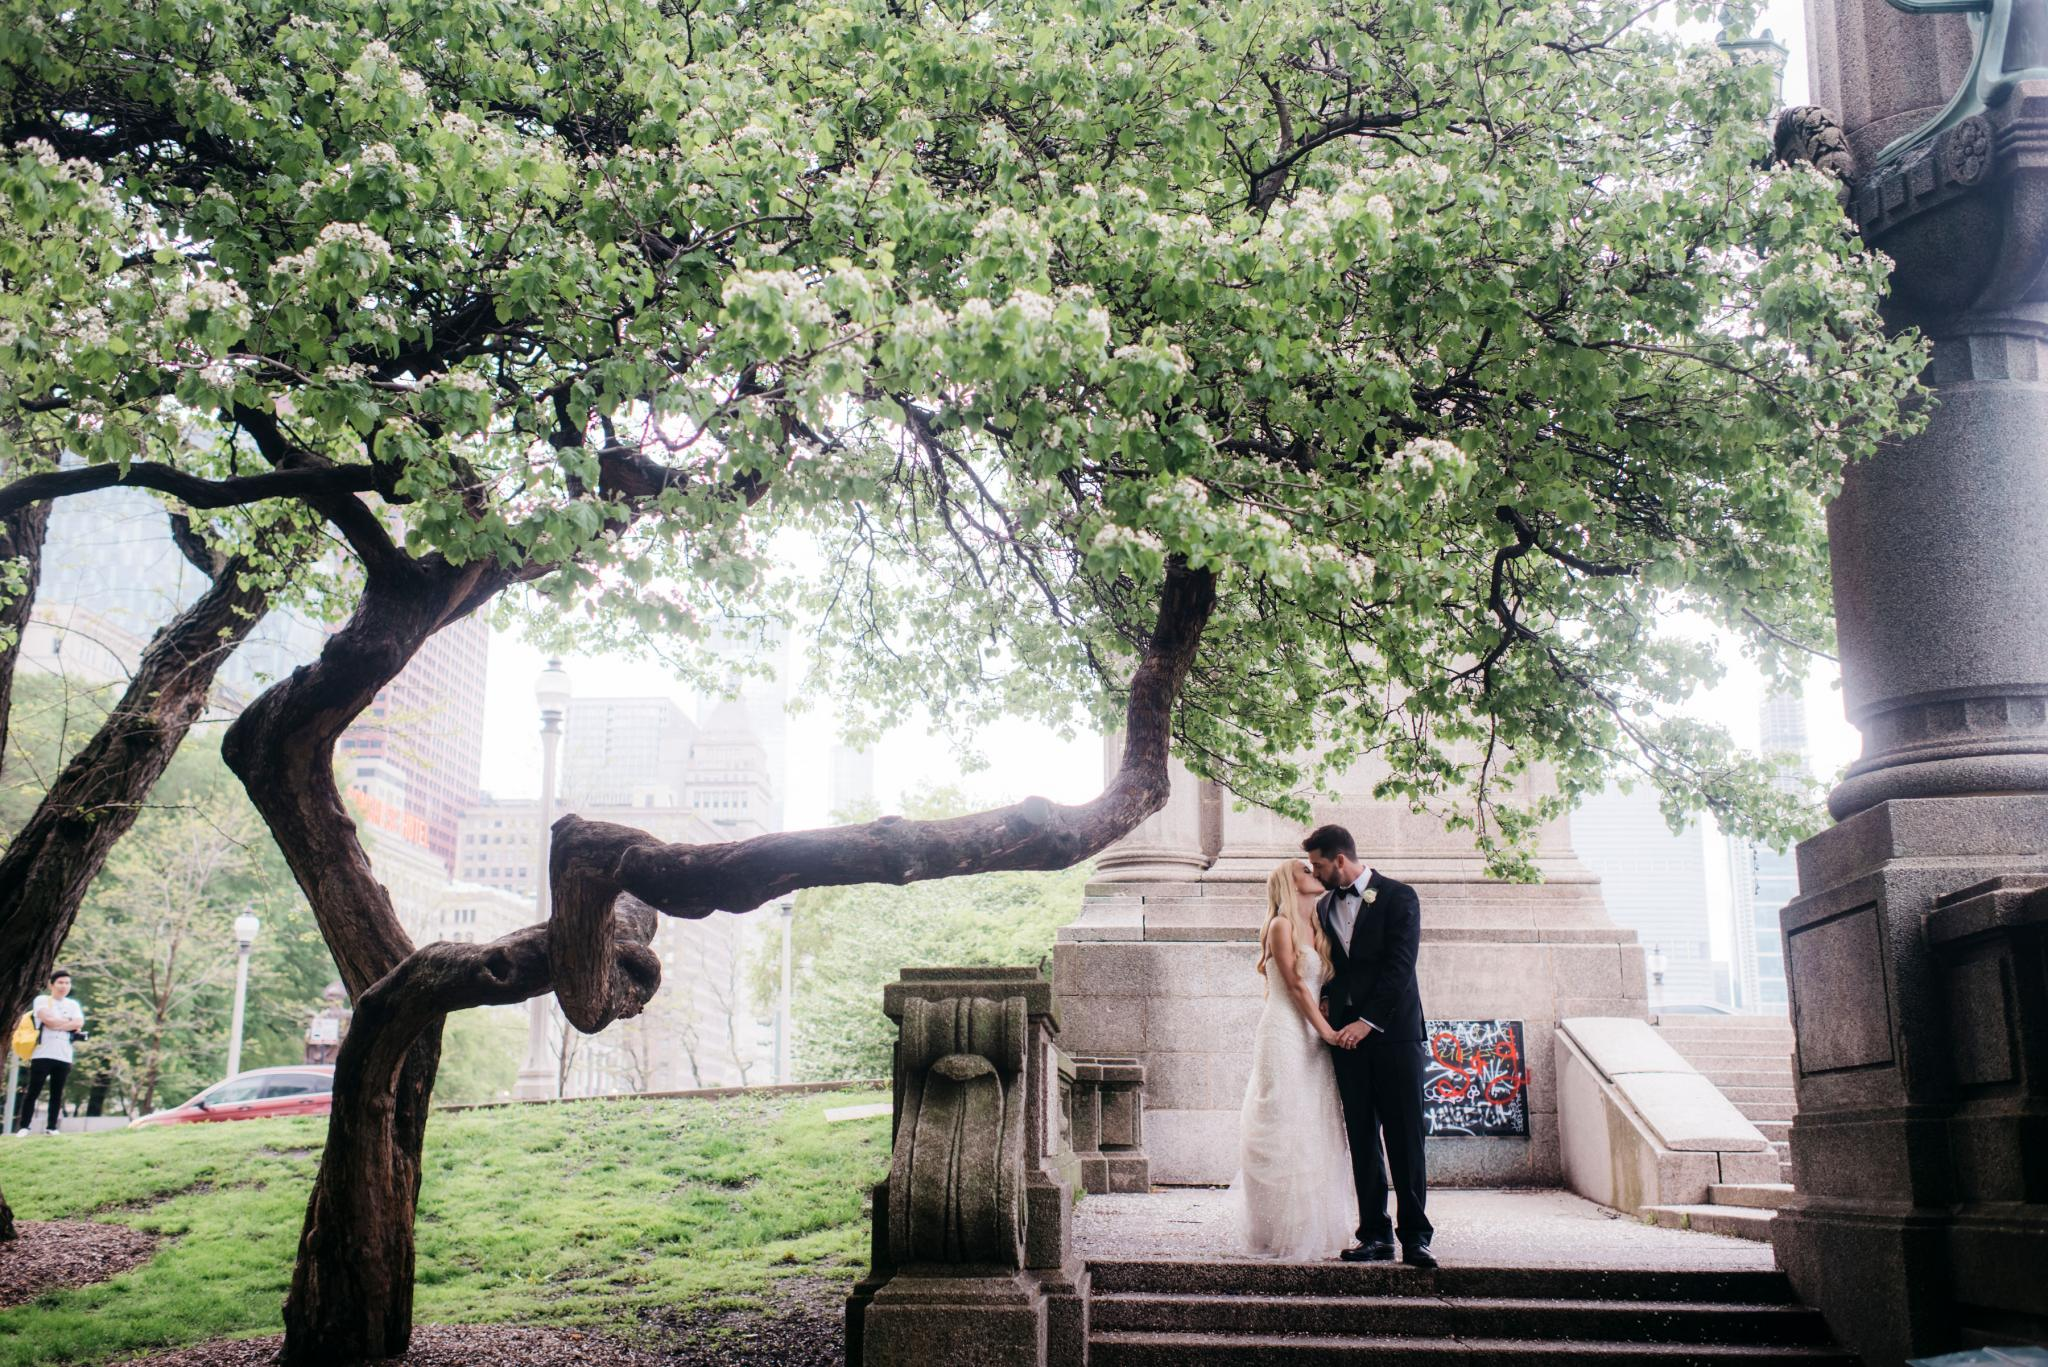 annie tommy venue SIX10 chicago, il wedding bride groom